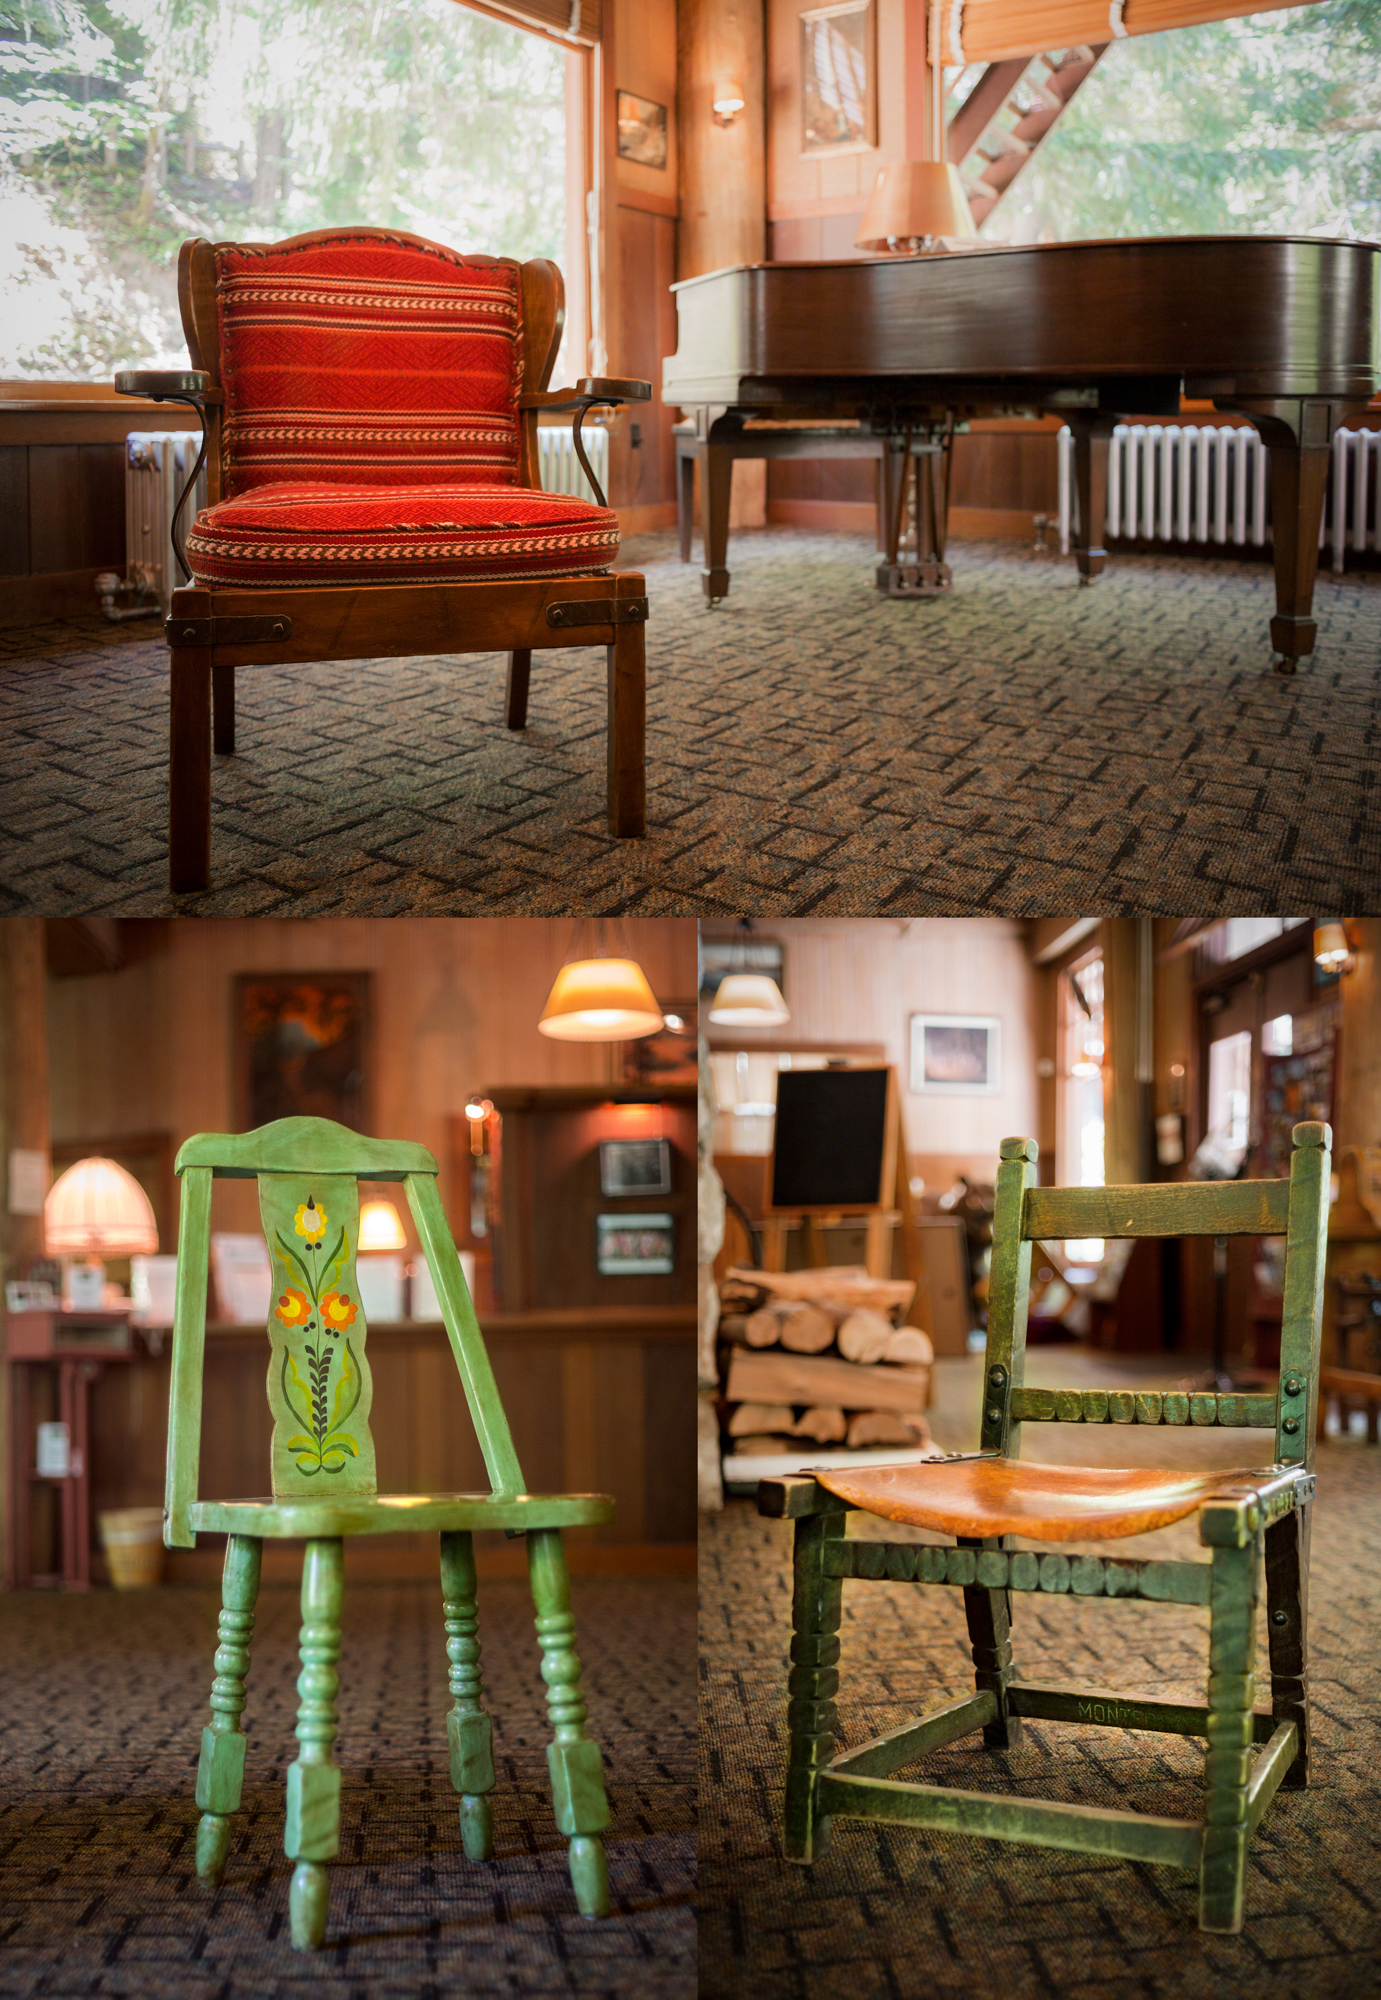 Chateau-Monterey-Furniture-Triptic.jpg